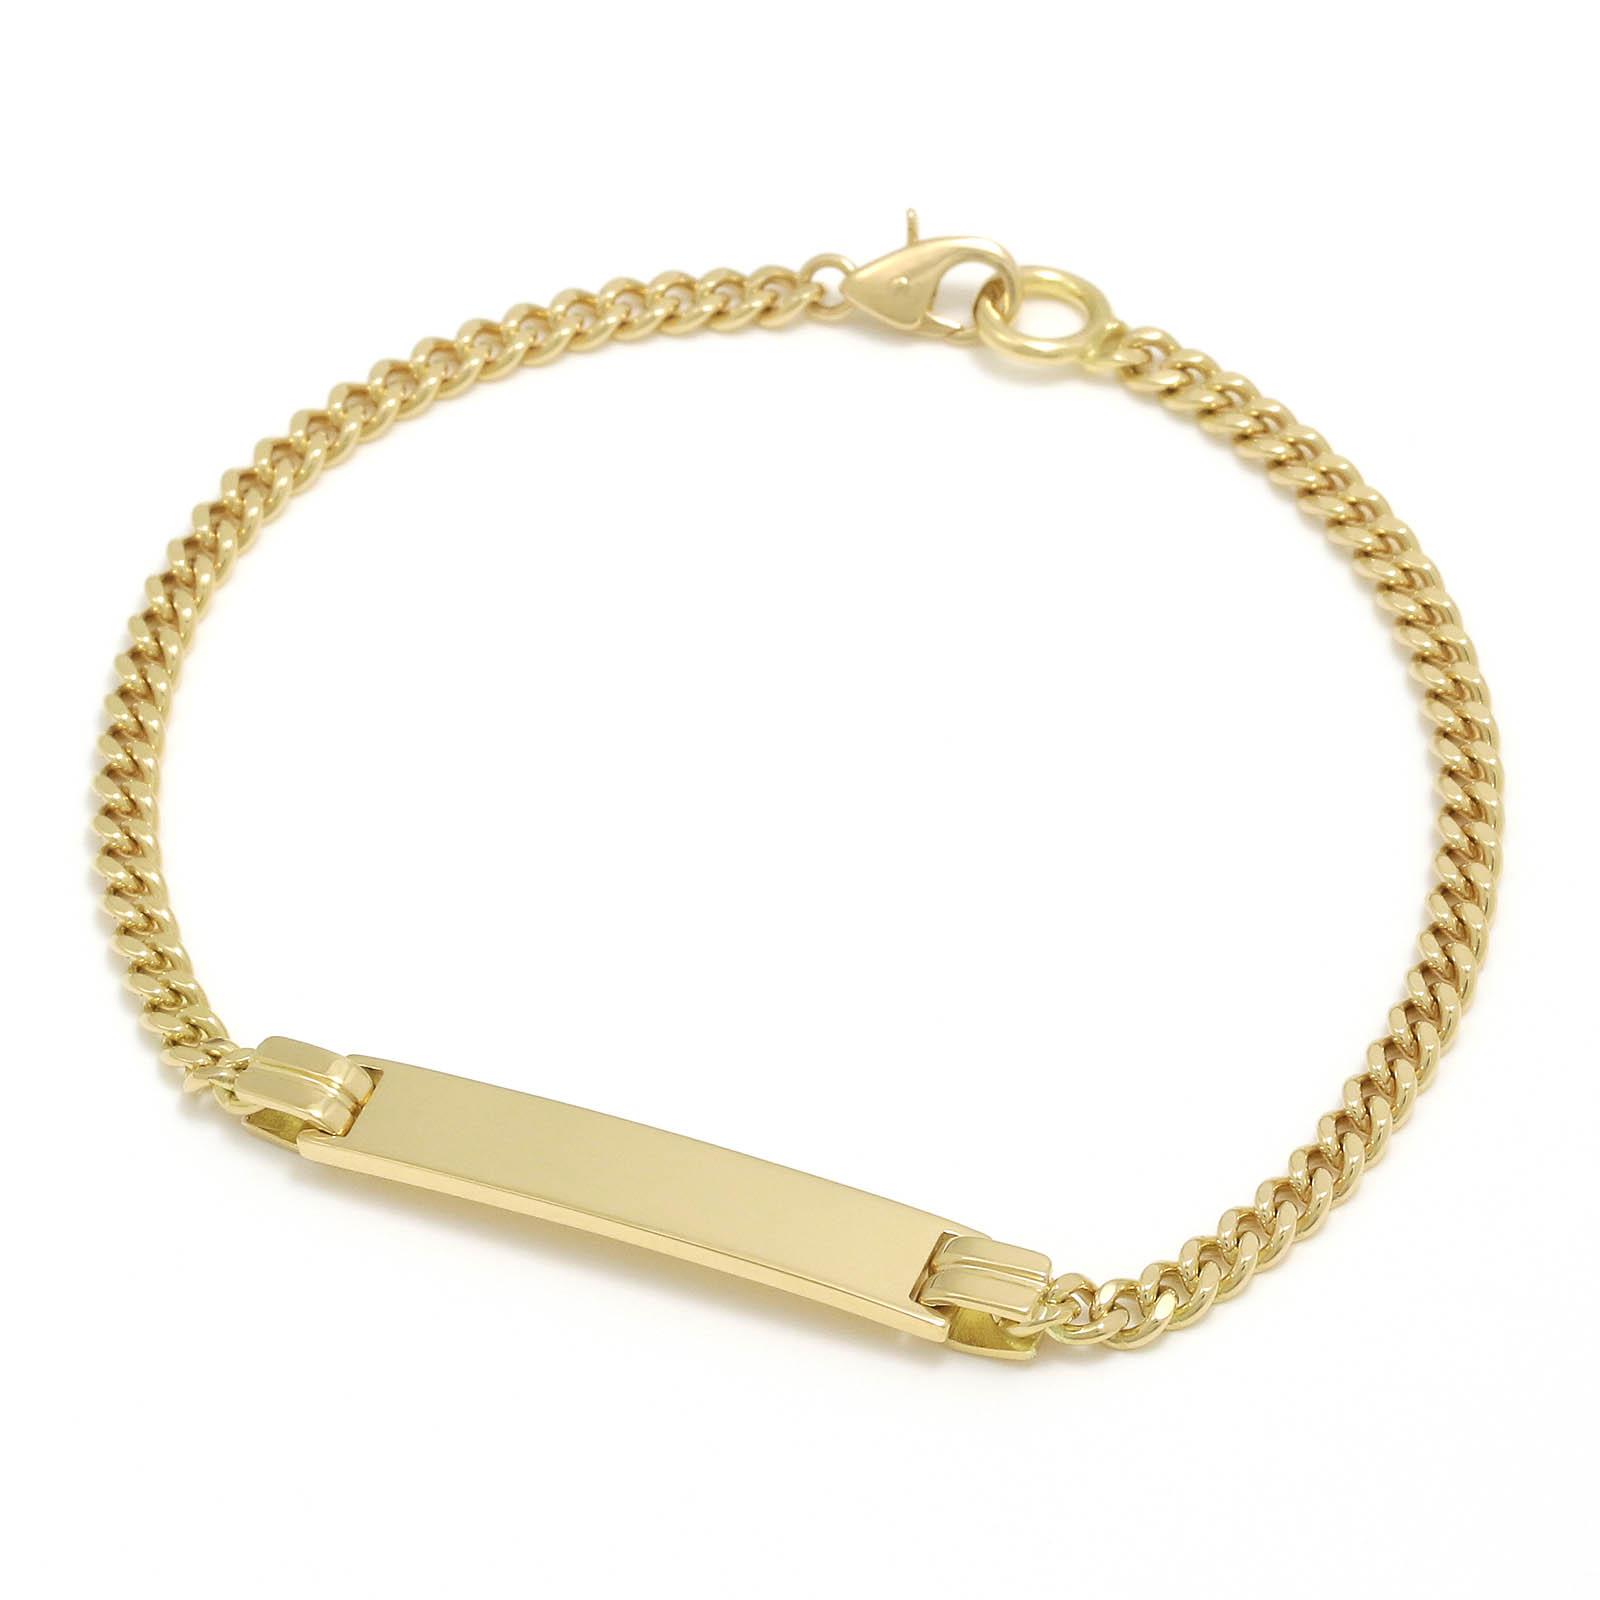 Narrow ID Chain Bracelet - K18Yellow Gold